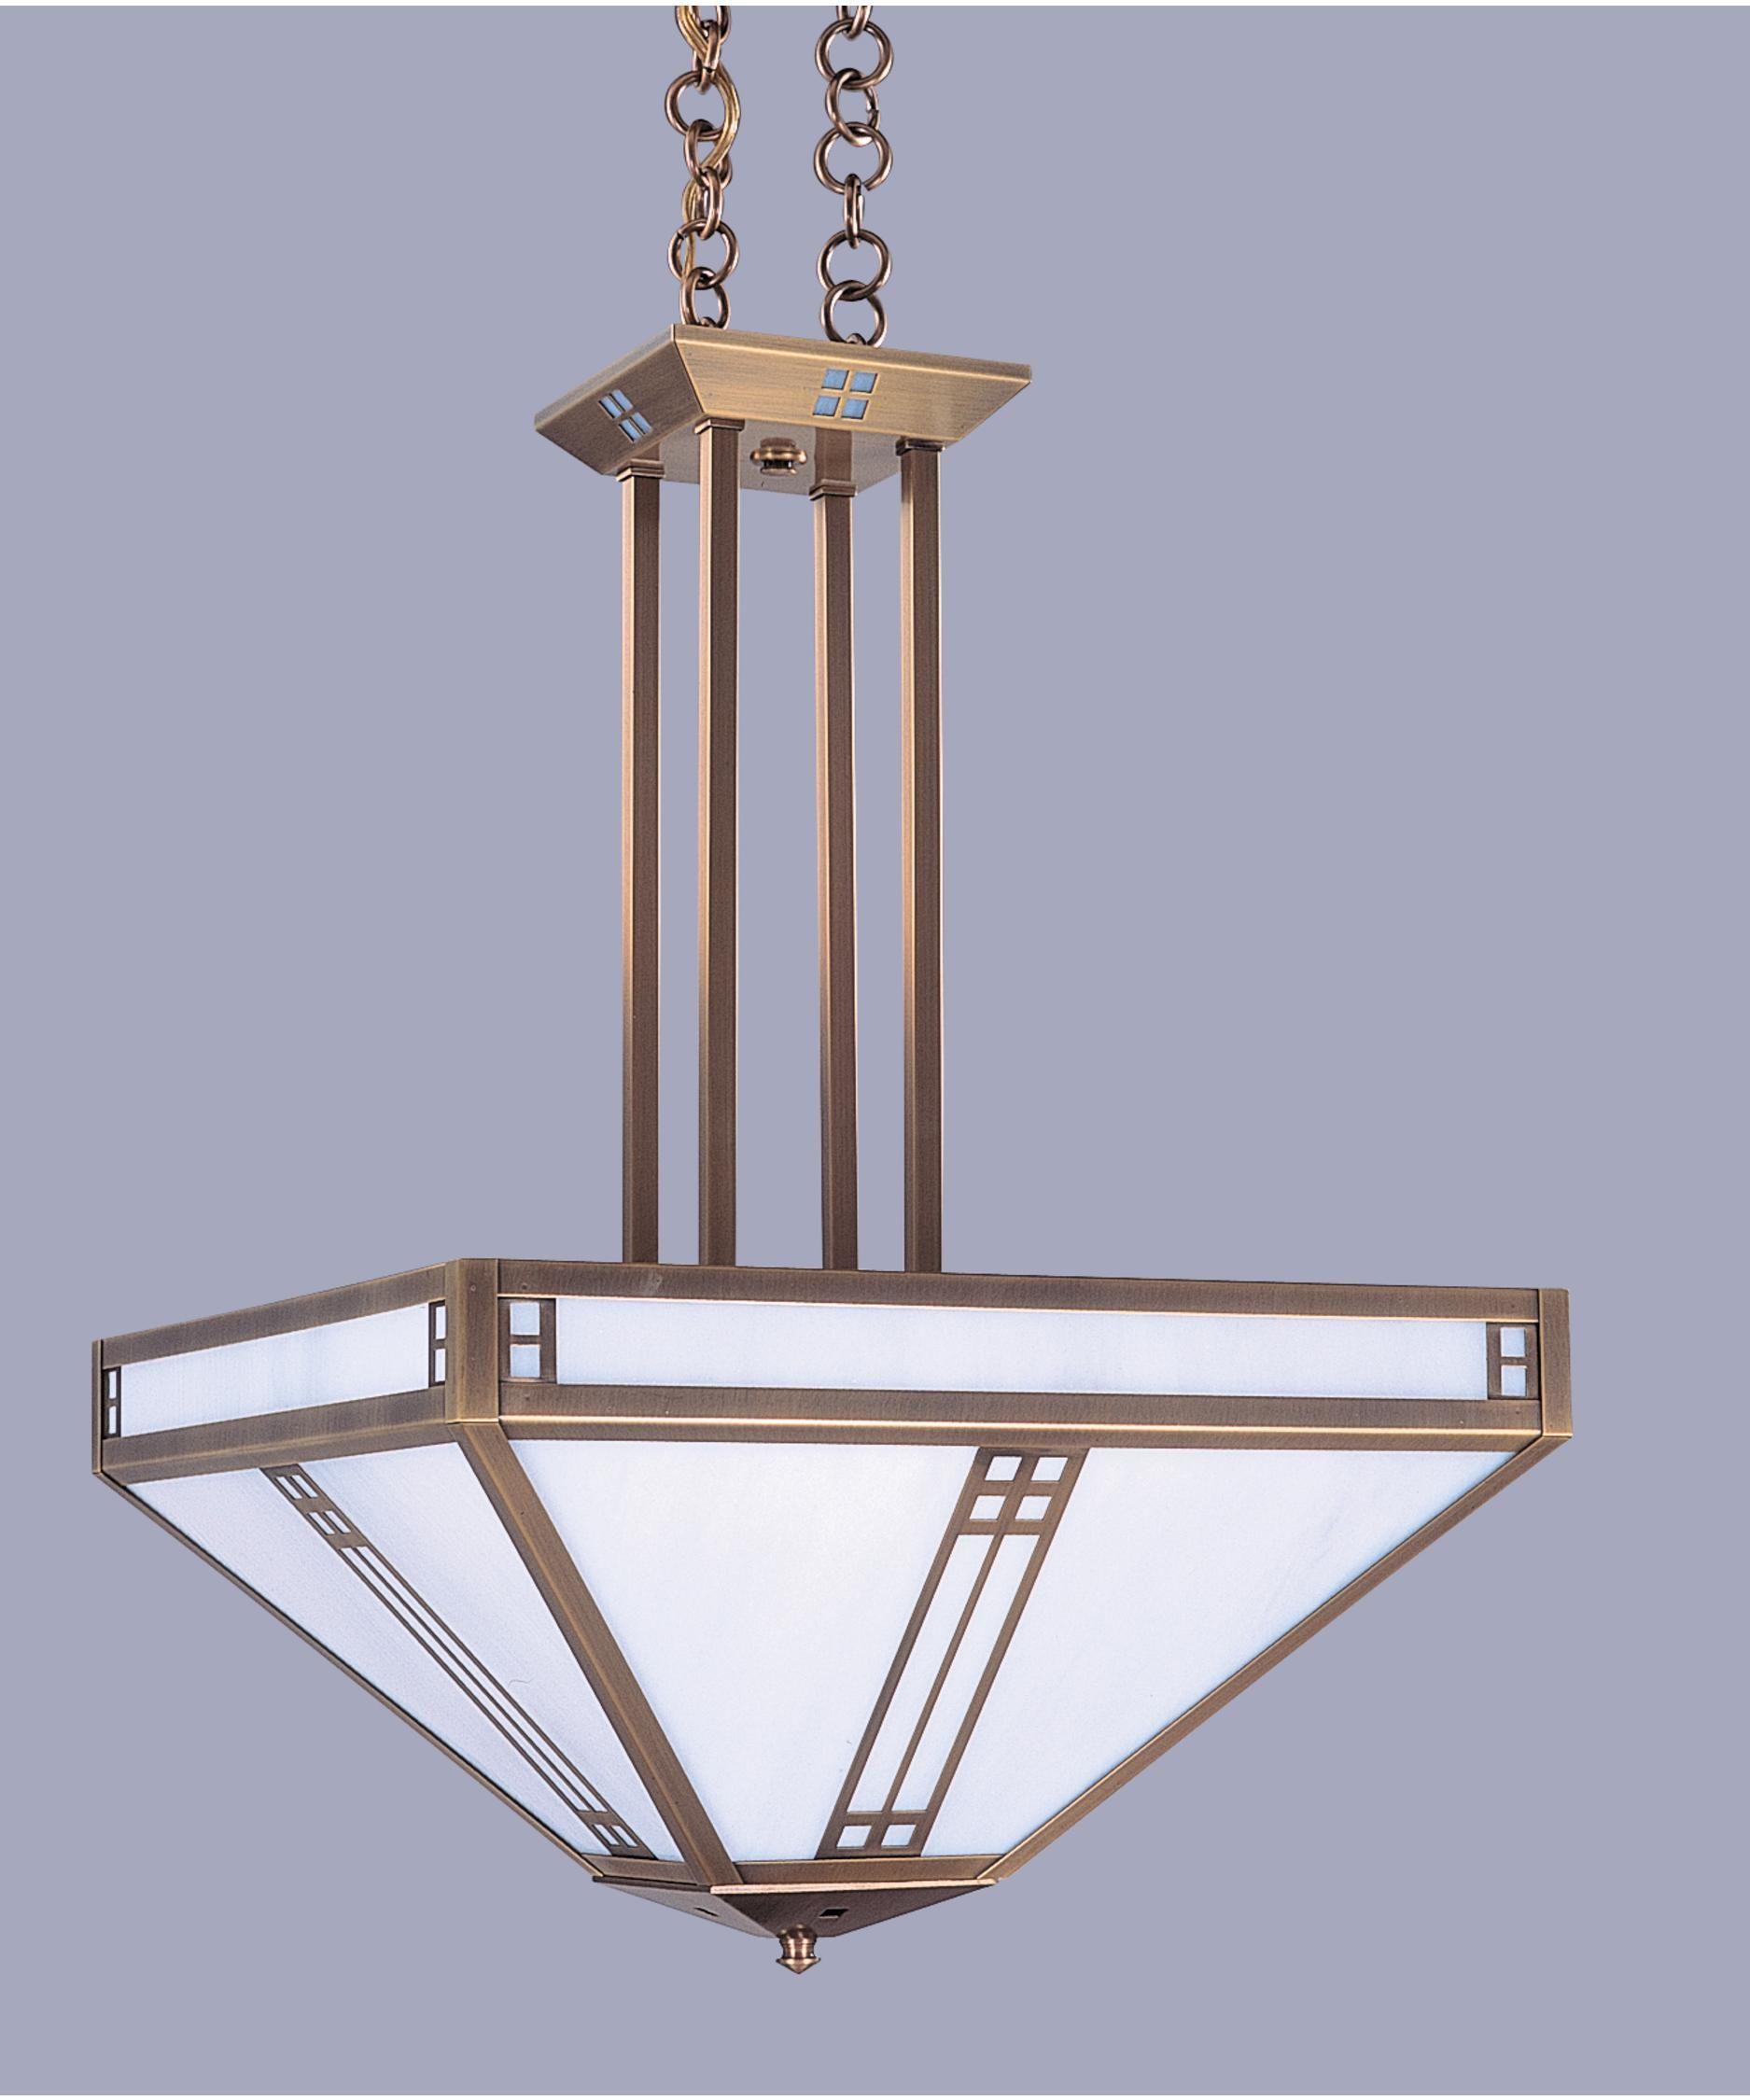 Arroyo craftsman pcch 18 prairie 18 inch wide 4 light large pendant capitol lighting 1 800lighting com